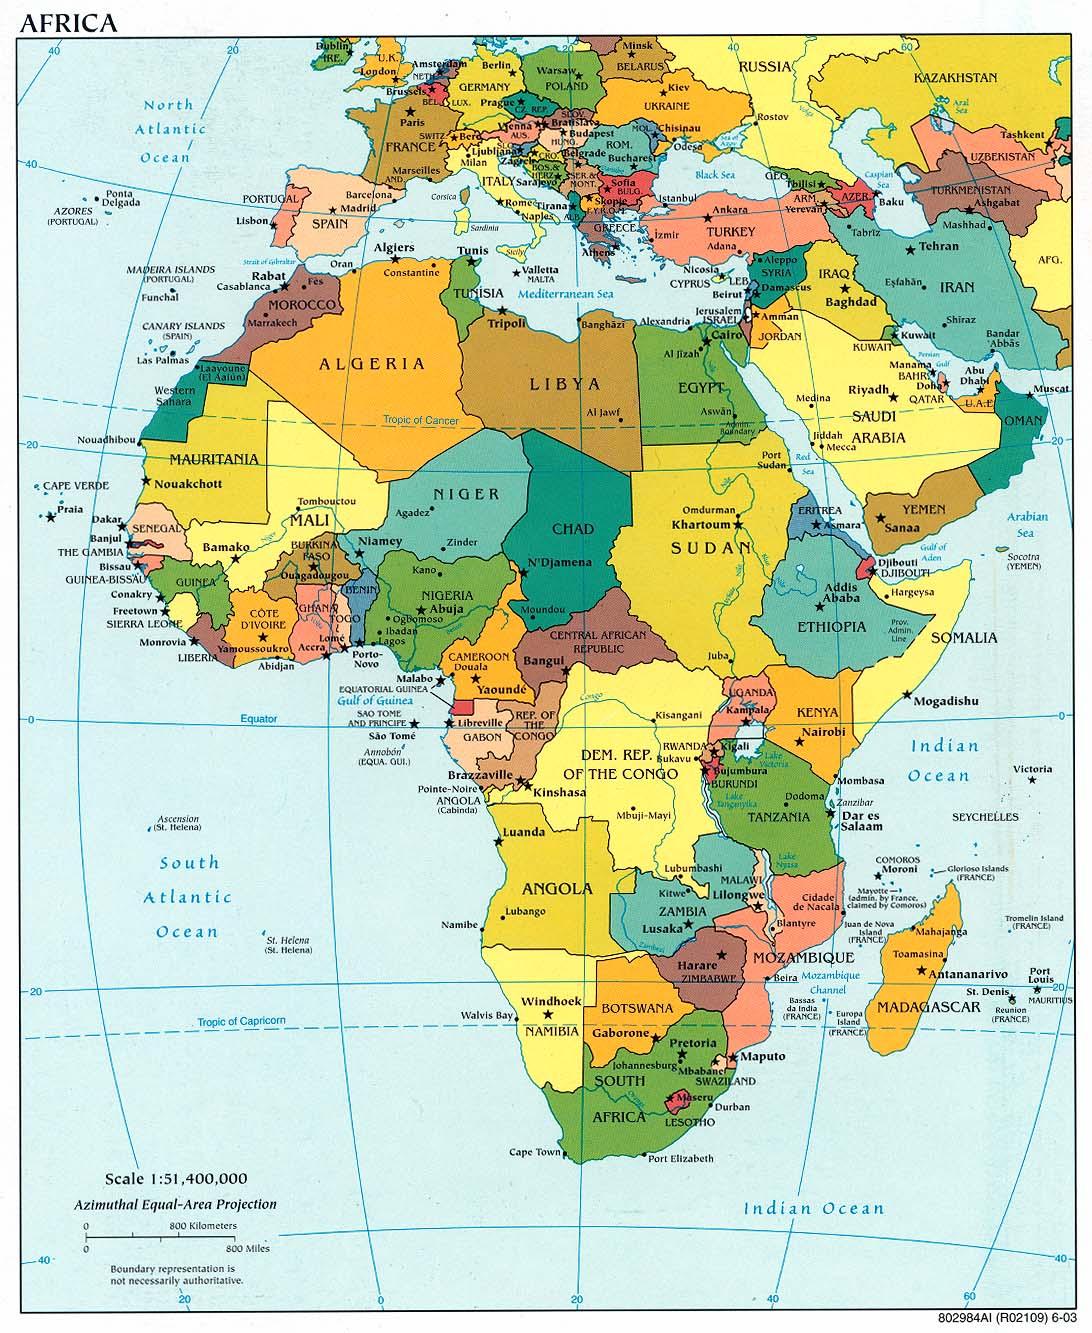 Mapa Politico De Africa En Español.Mapa Politico Africa Epicentro Geografico